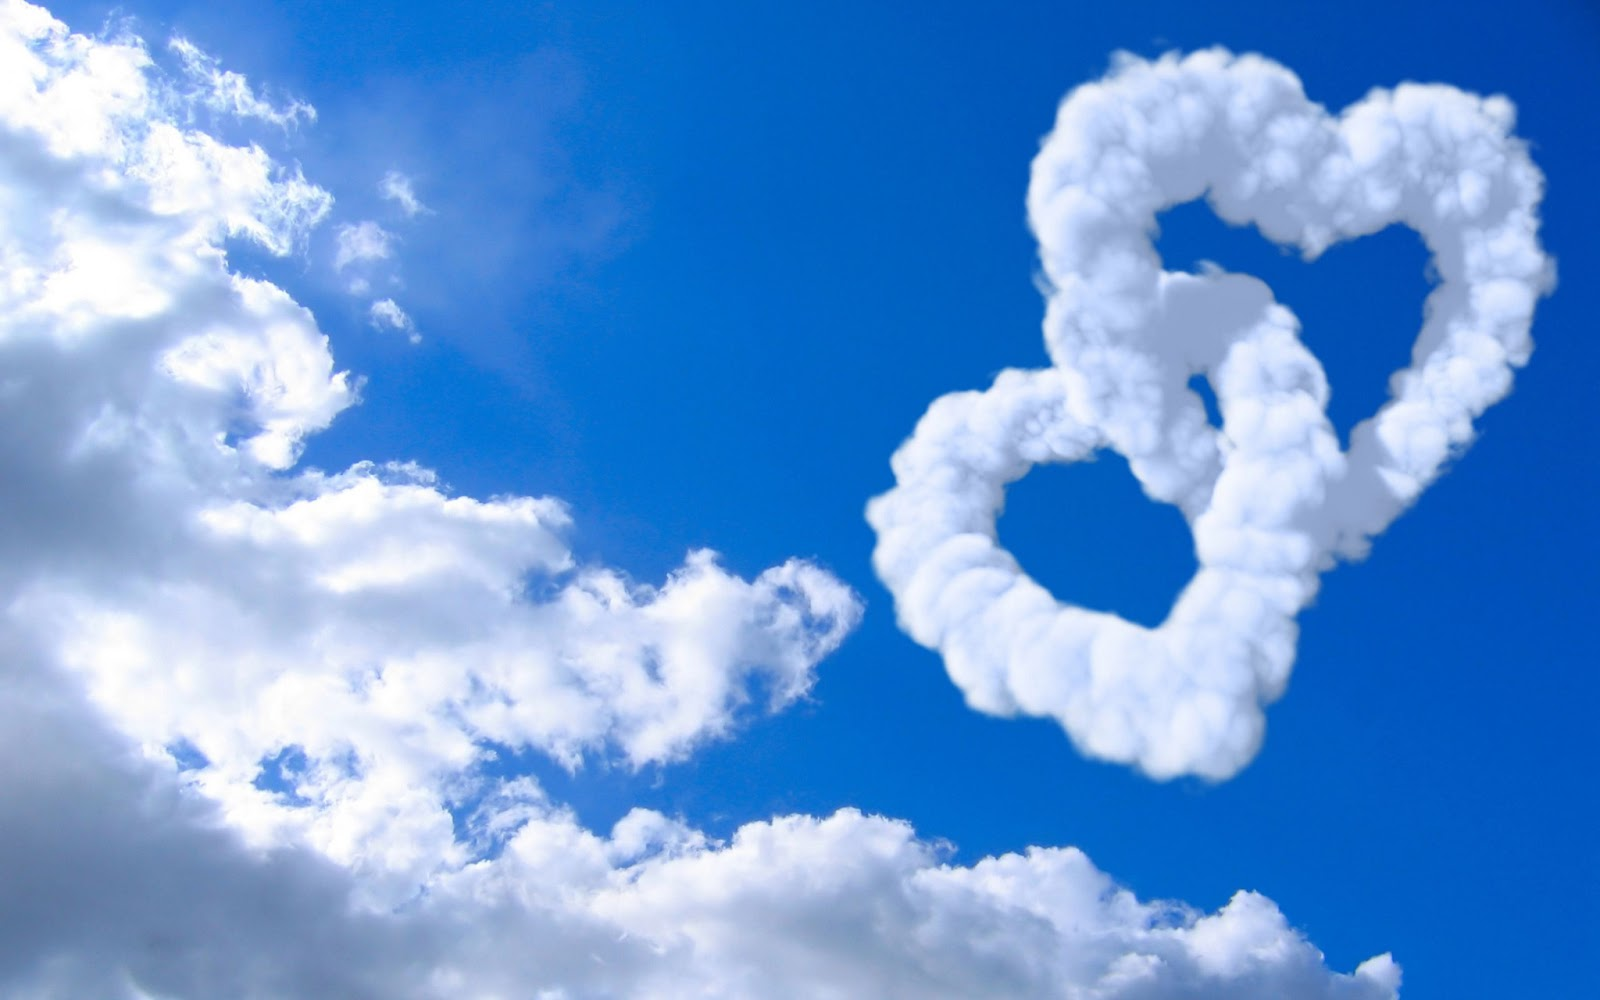 sky cloud wallpapers hd